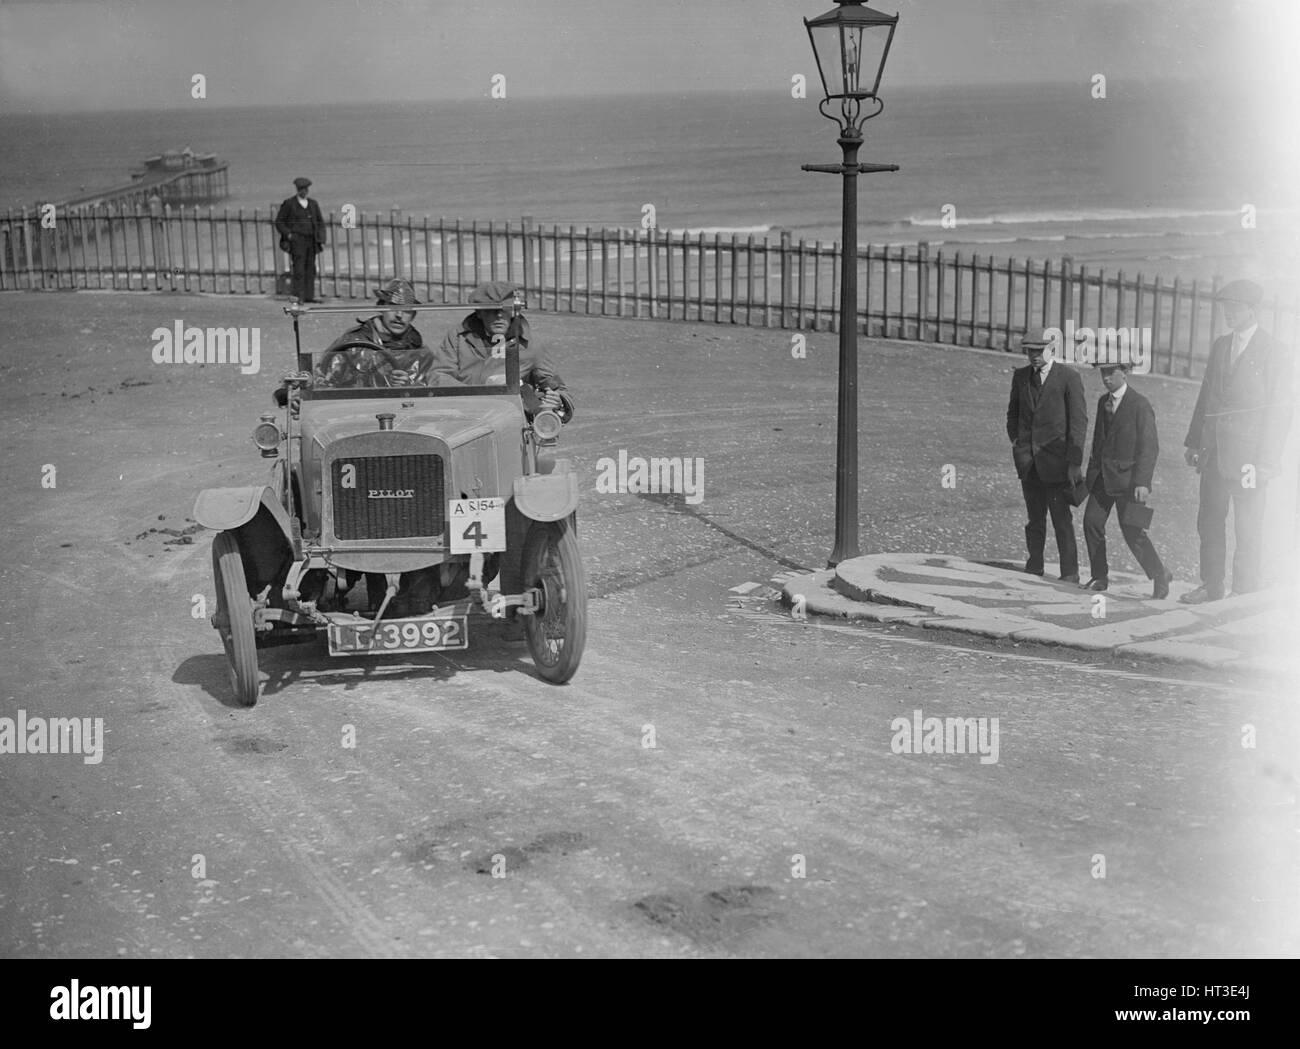 Pilot car at the seaside. Artist: Bill Brunell. - Stock Image